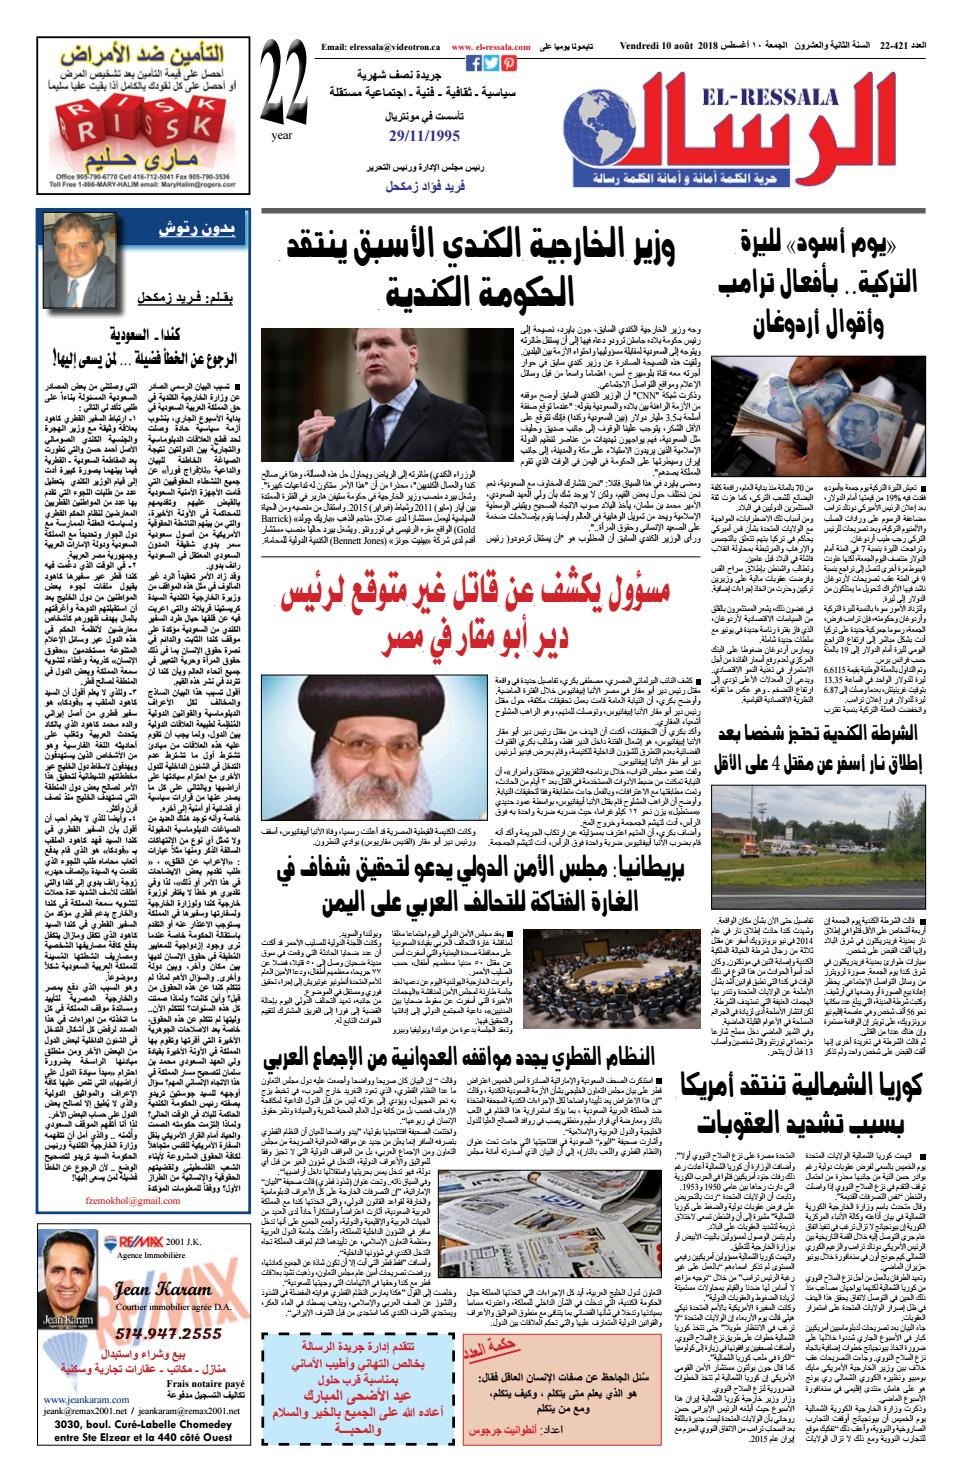 879957065 El Ressala Arabic newspaper Montreal Canada #421 August 10, 2018 by  MEDIAinTORONTO - issuu